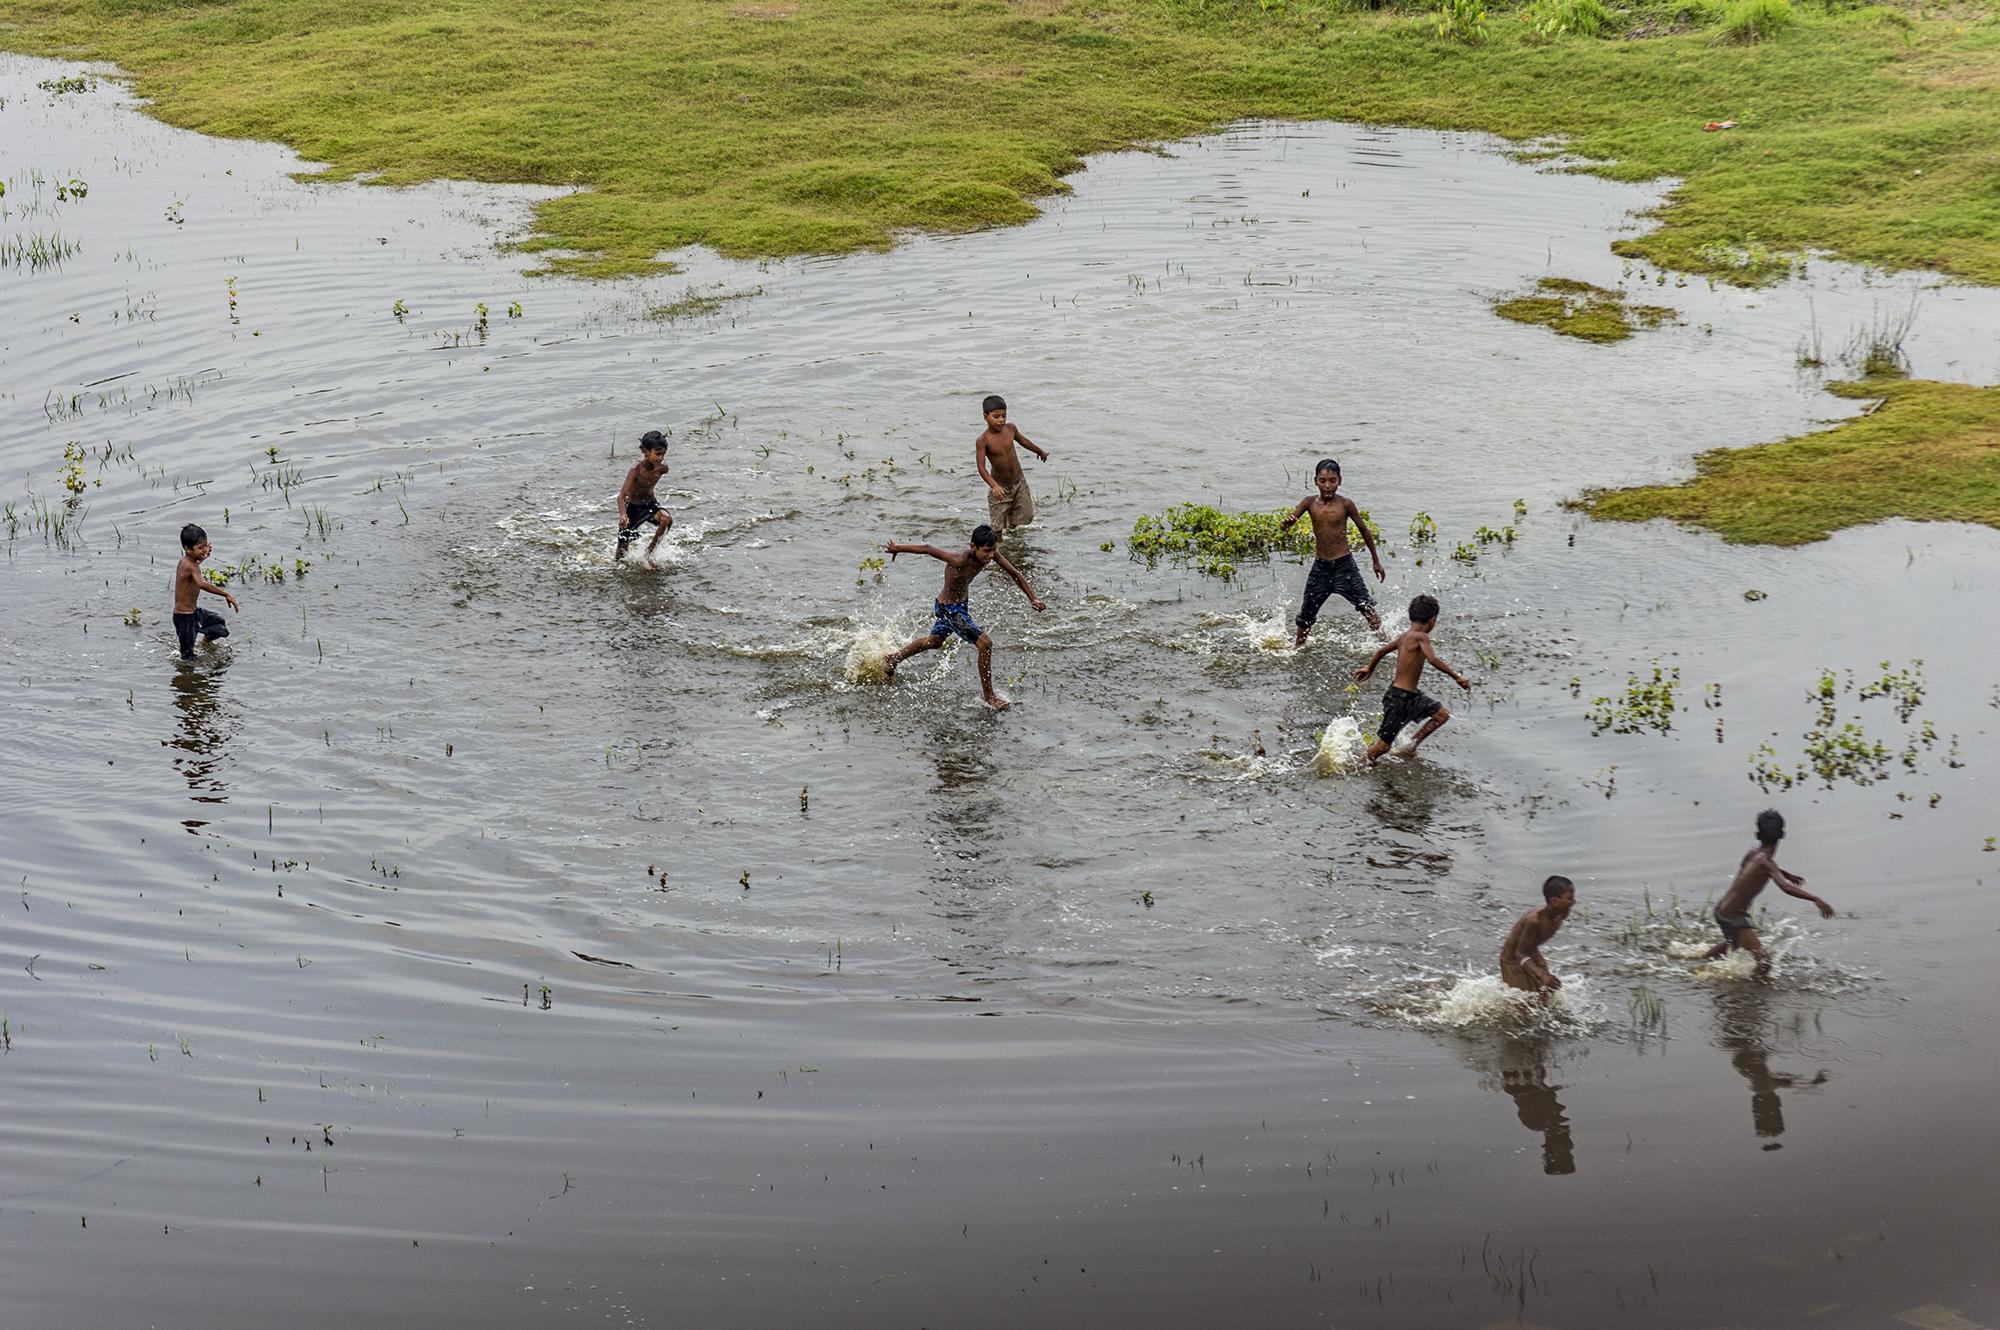 Children enjoying their bath in a hot summer day near Kolkata.